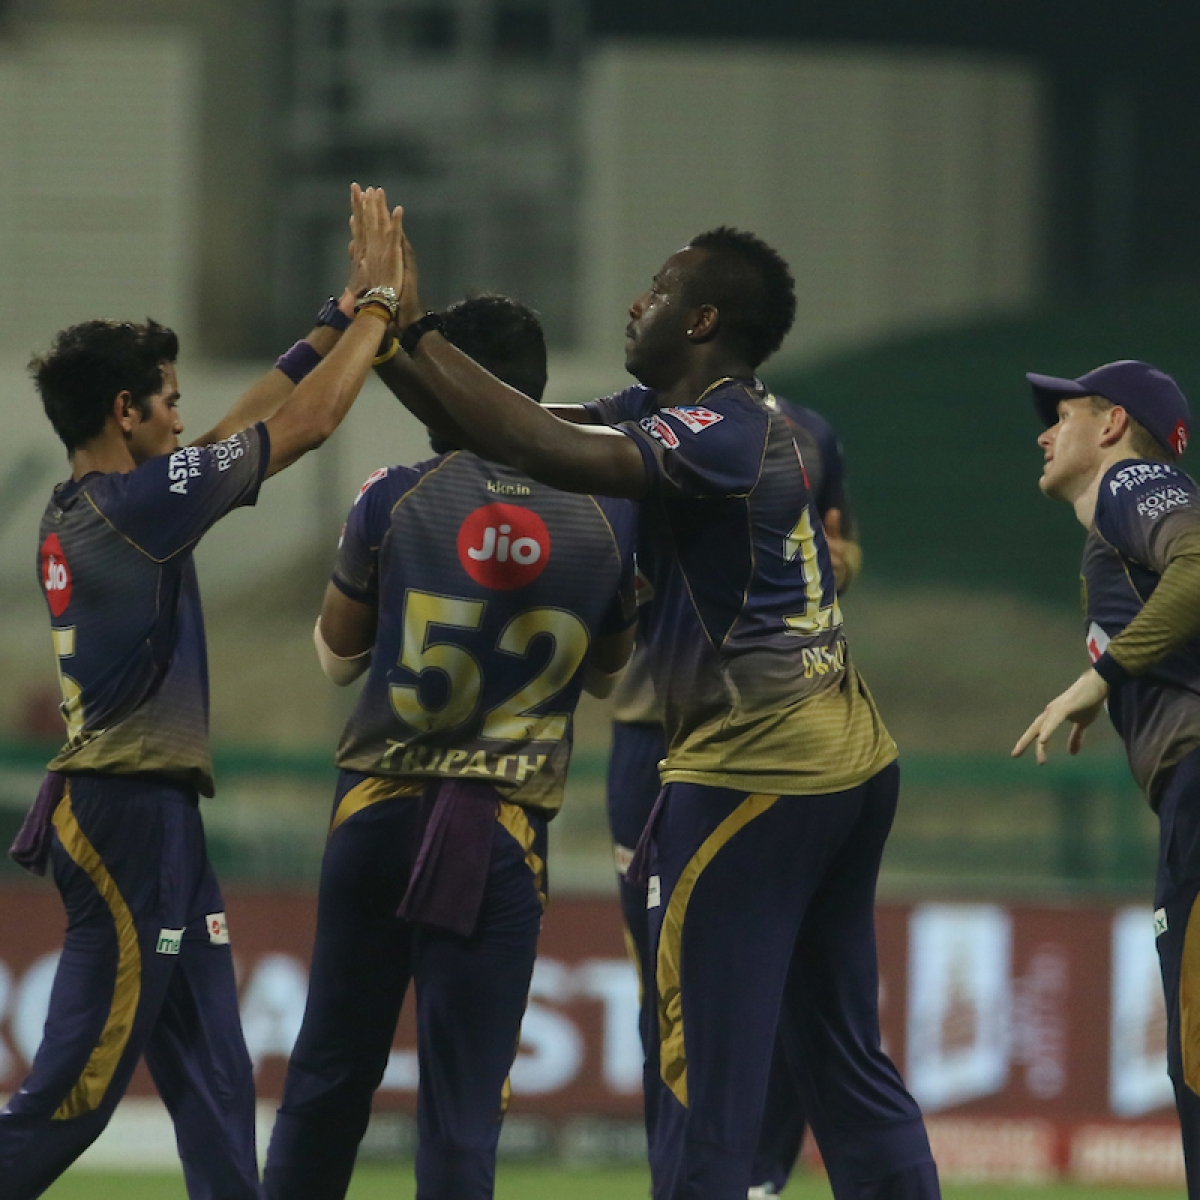 IPL 2020 KKR vs SRH: Twitter in shock after 'unfit' Andre Russell bowls last over